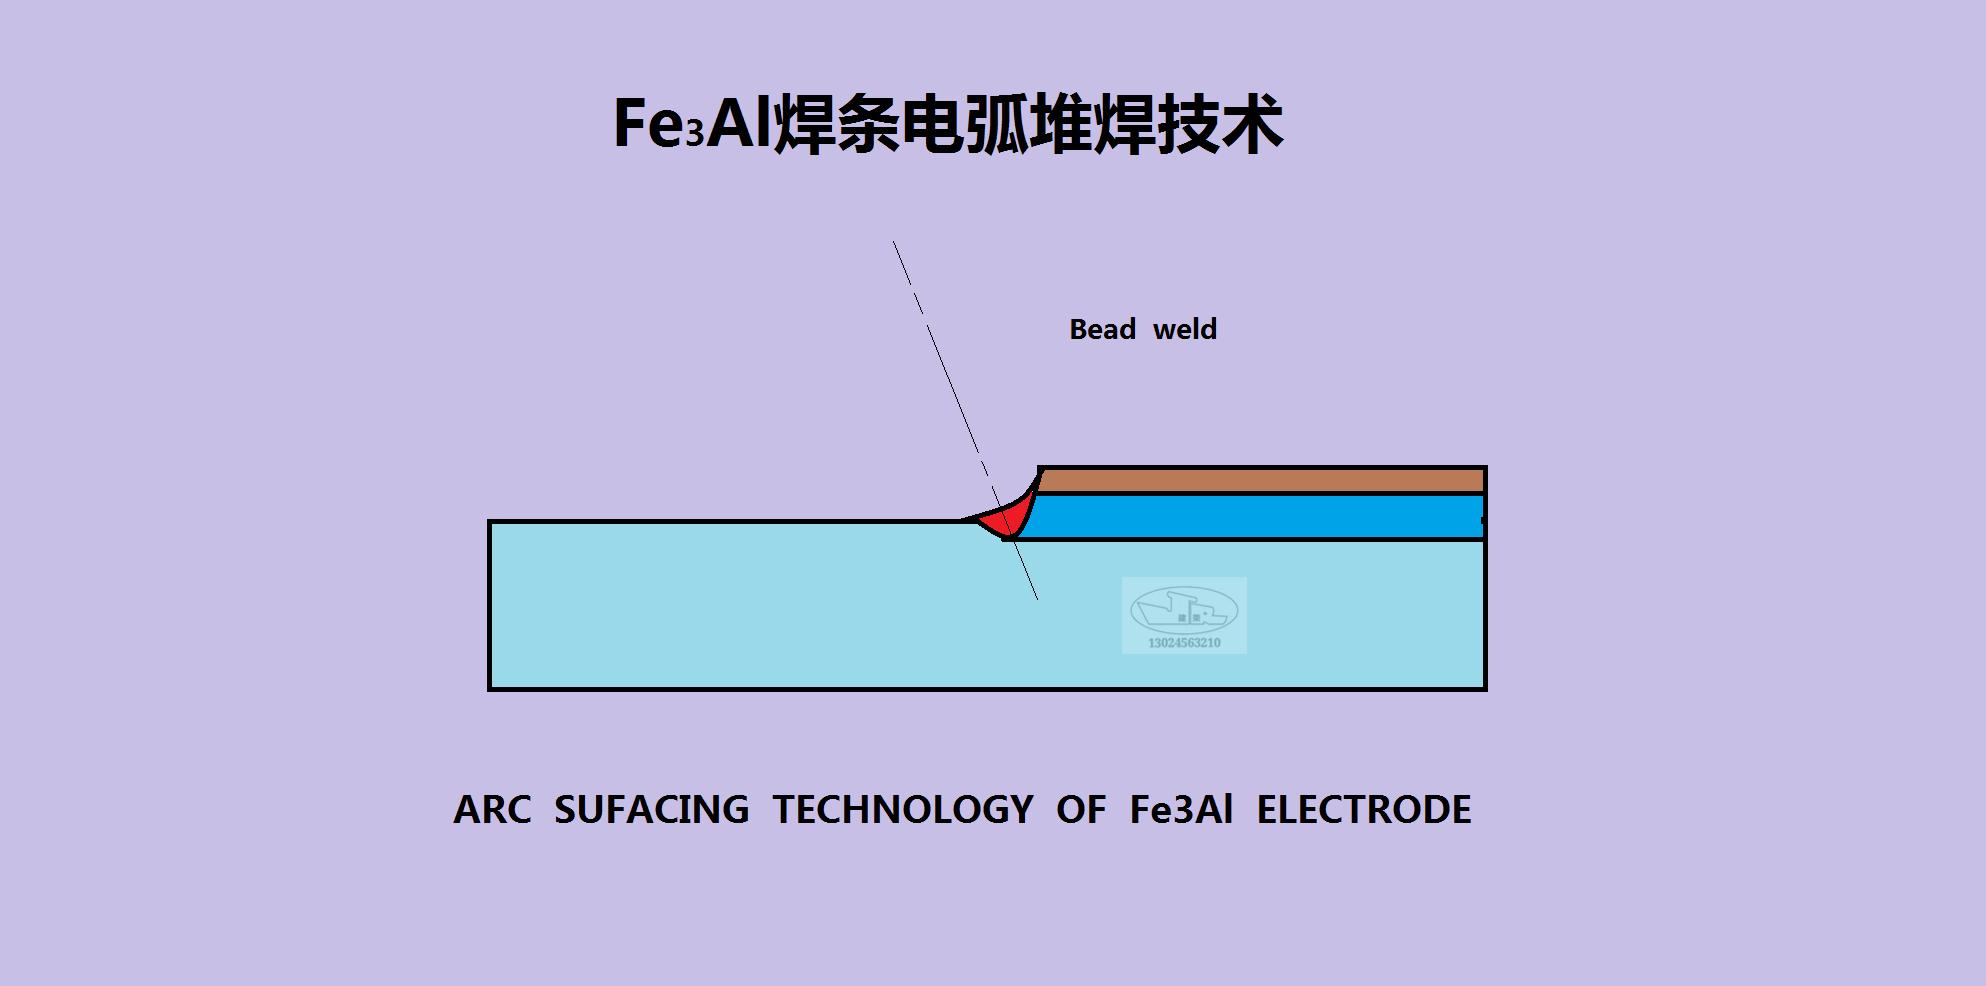 Fe3Al焊条电弧堆焊工艺技术